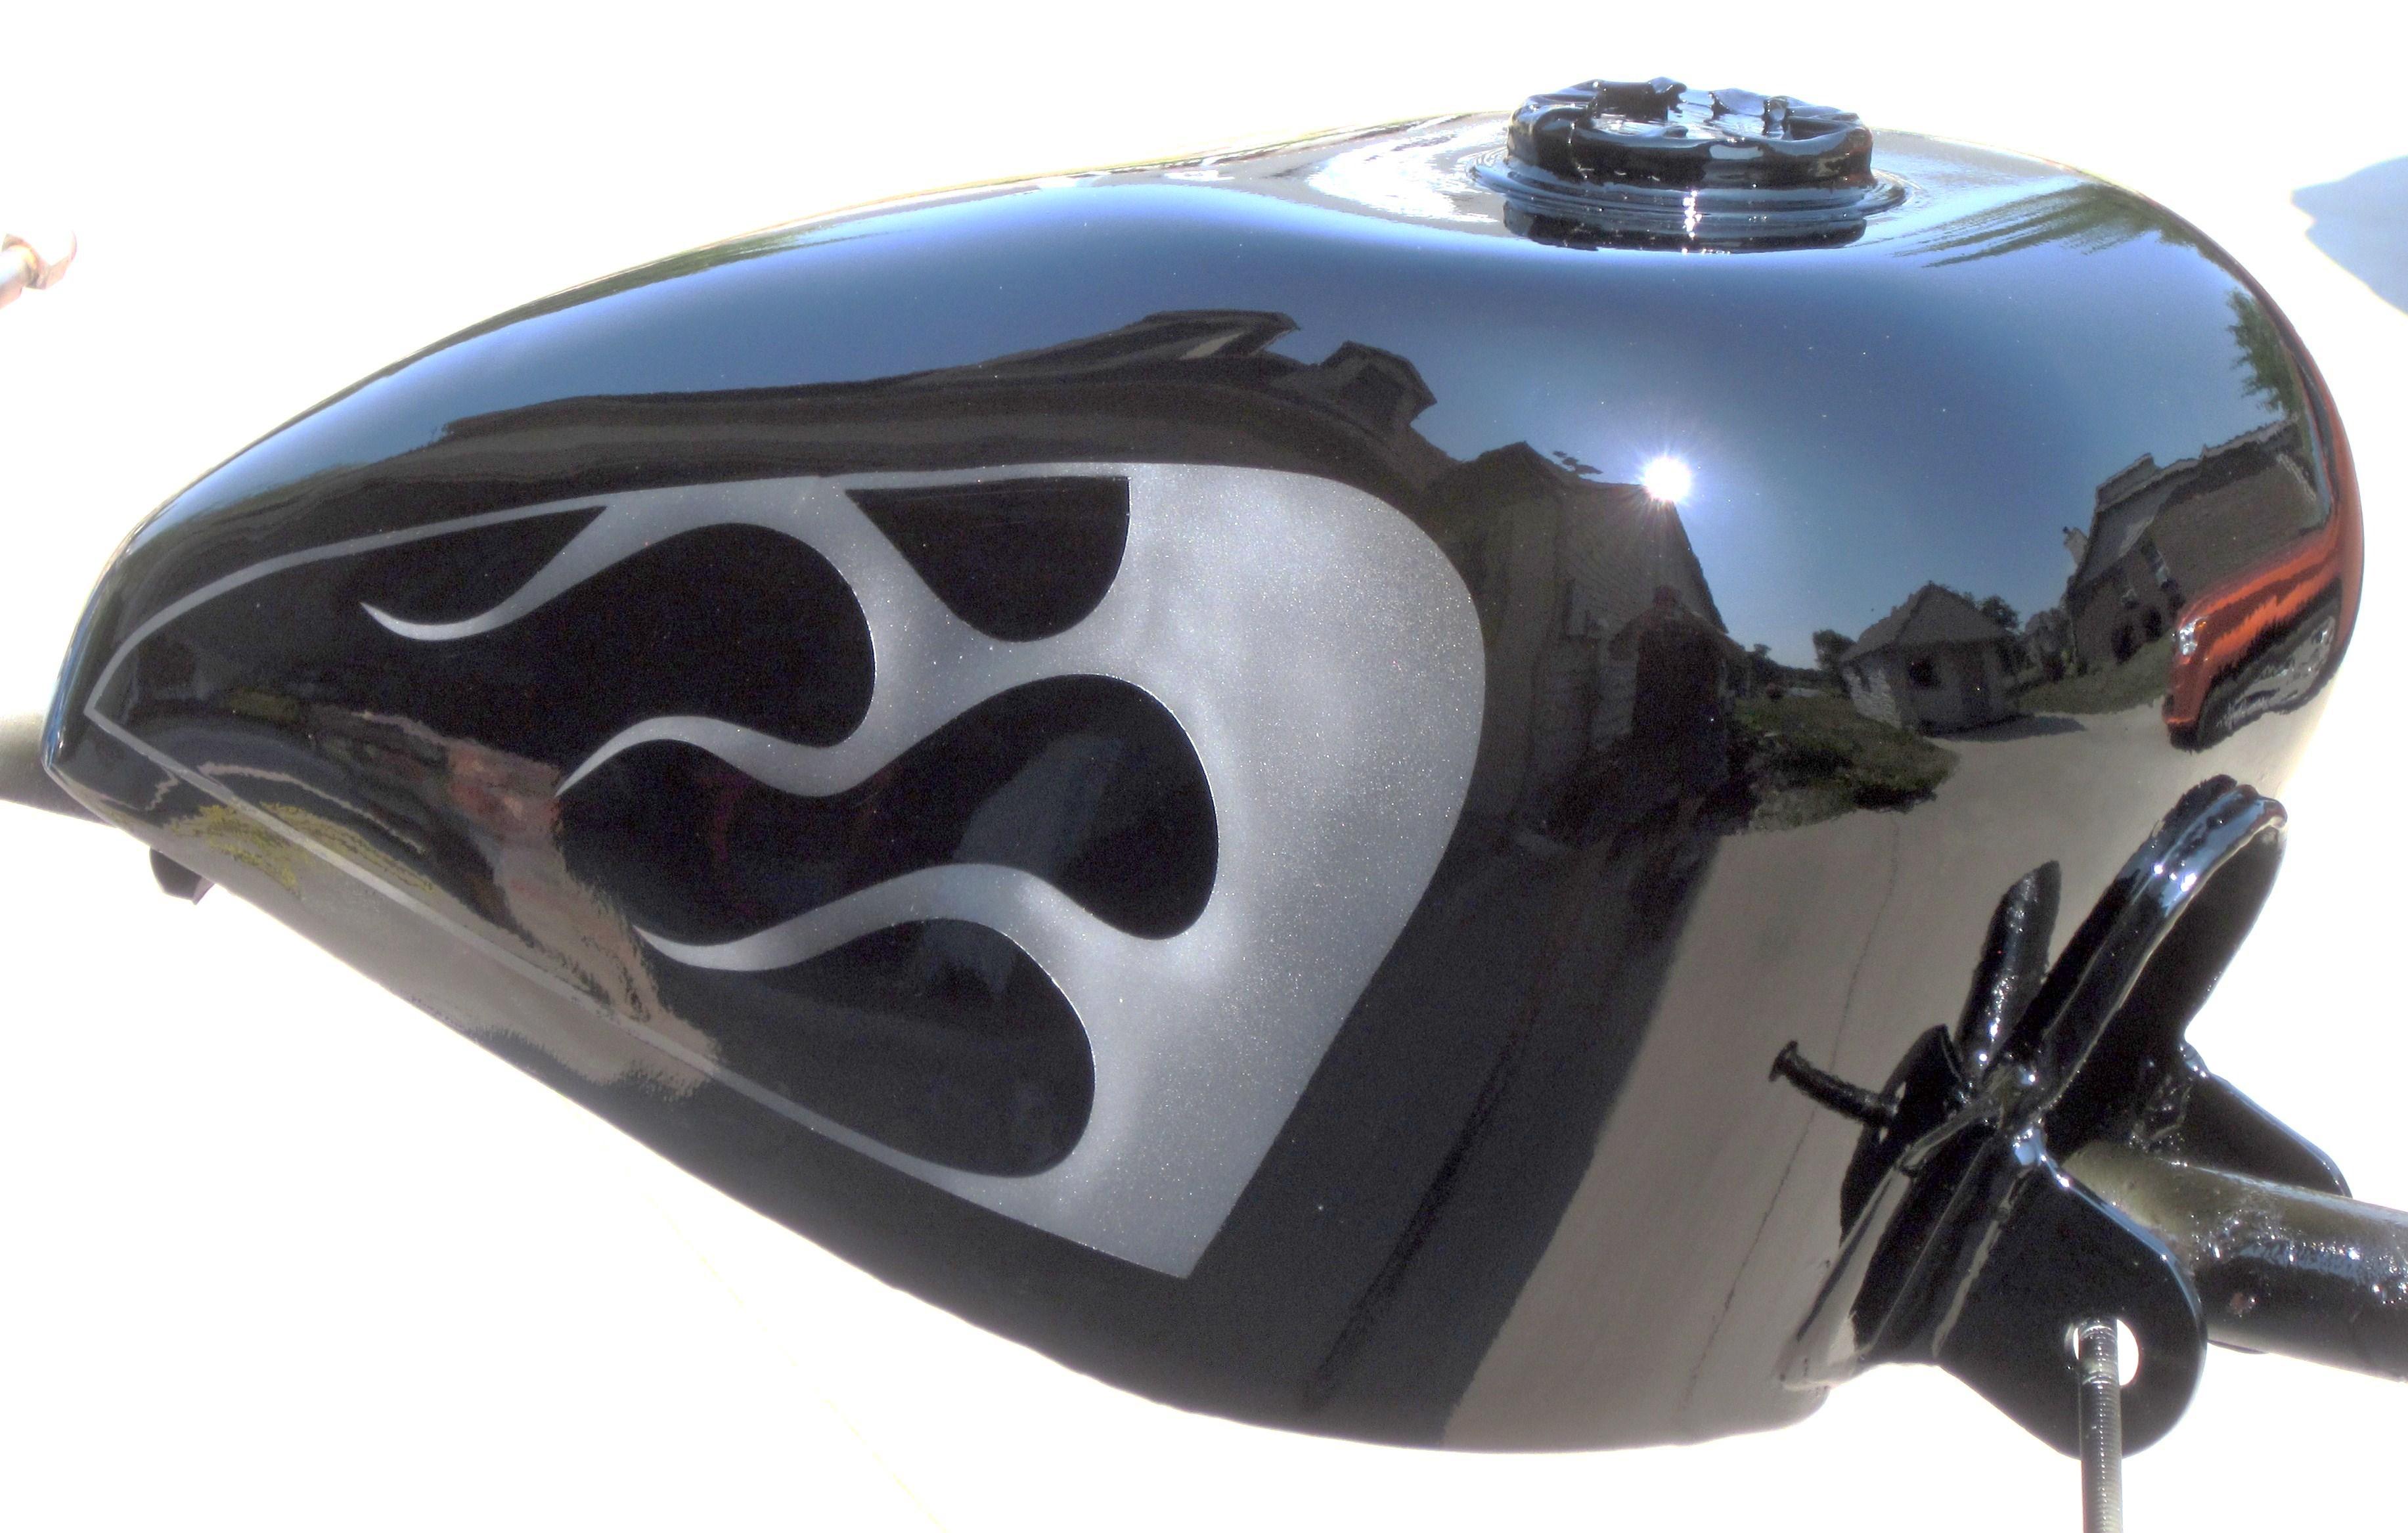 Click image for larger version  Name:bike, tank, paint gun 015.JPG Views:105 Size:1.05 MB ID:67149